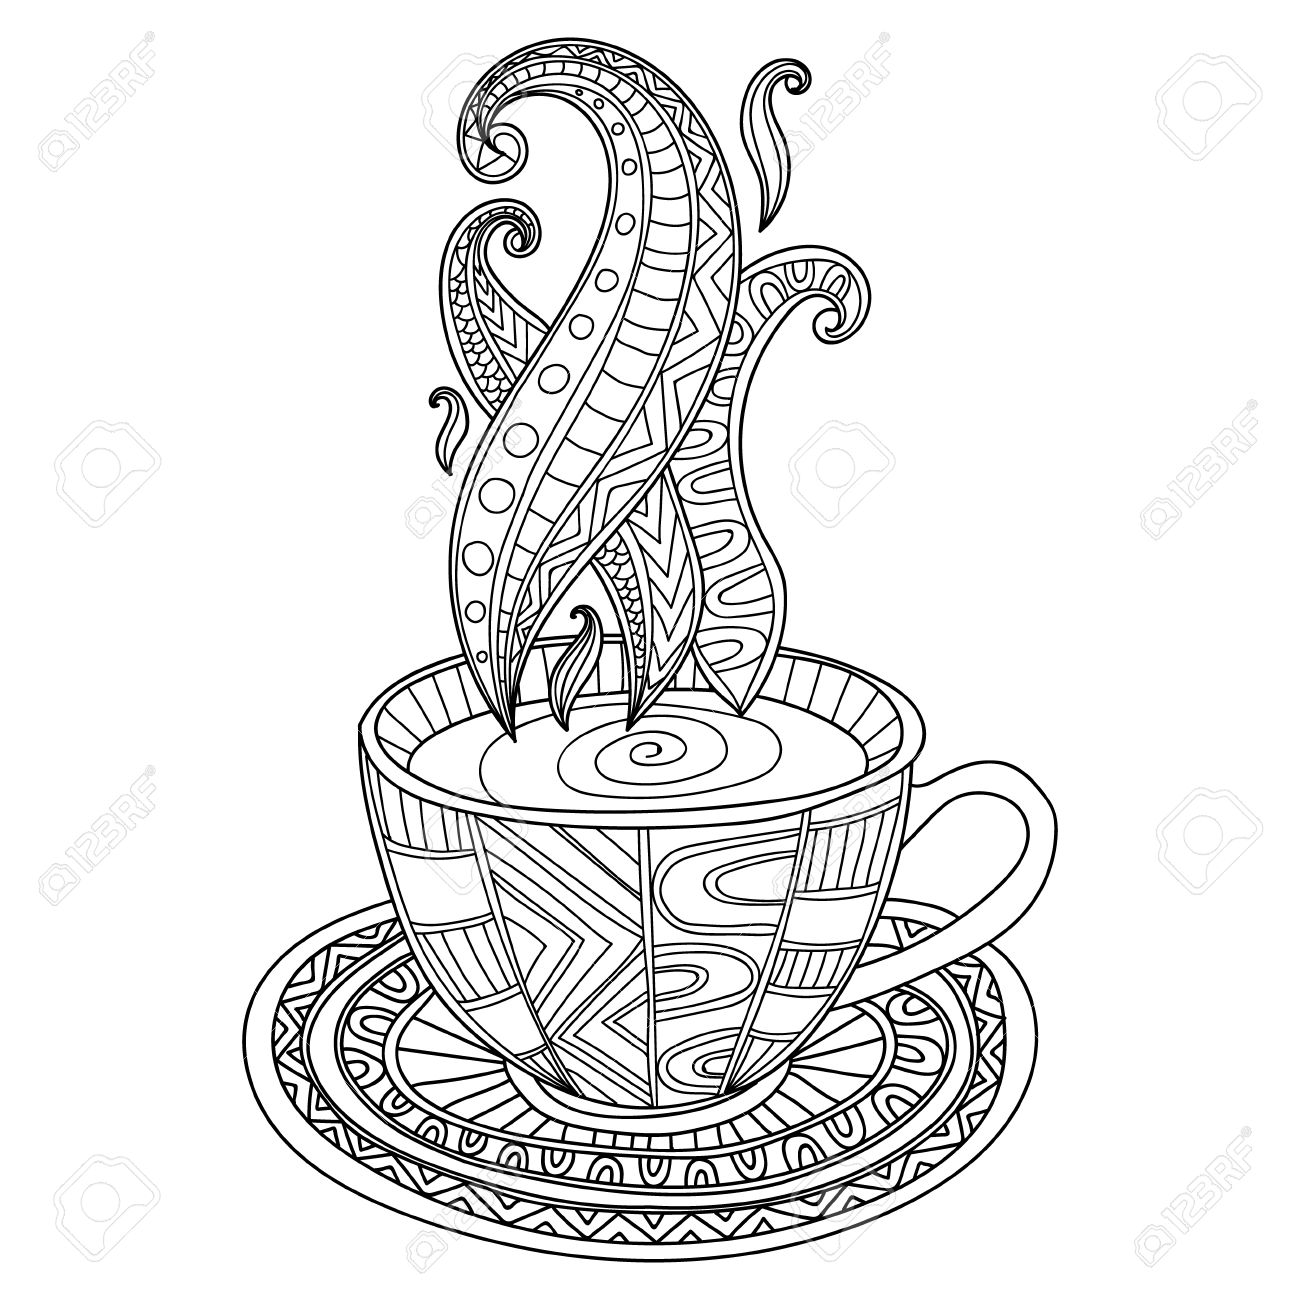 Vector Kaffee Oder Tee-Tasse Mit Abstrakten Ornamenten. Hand ...